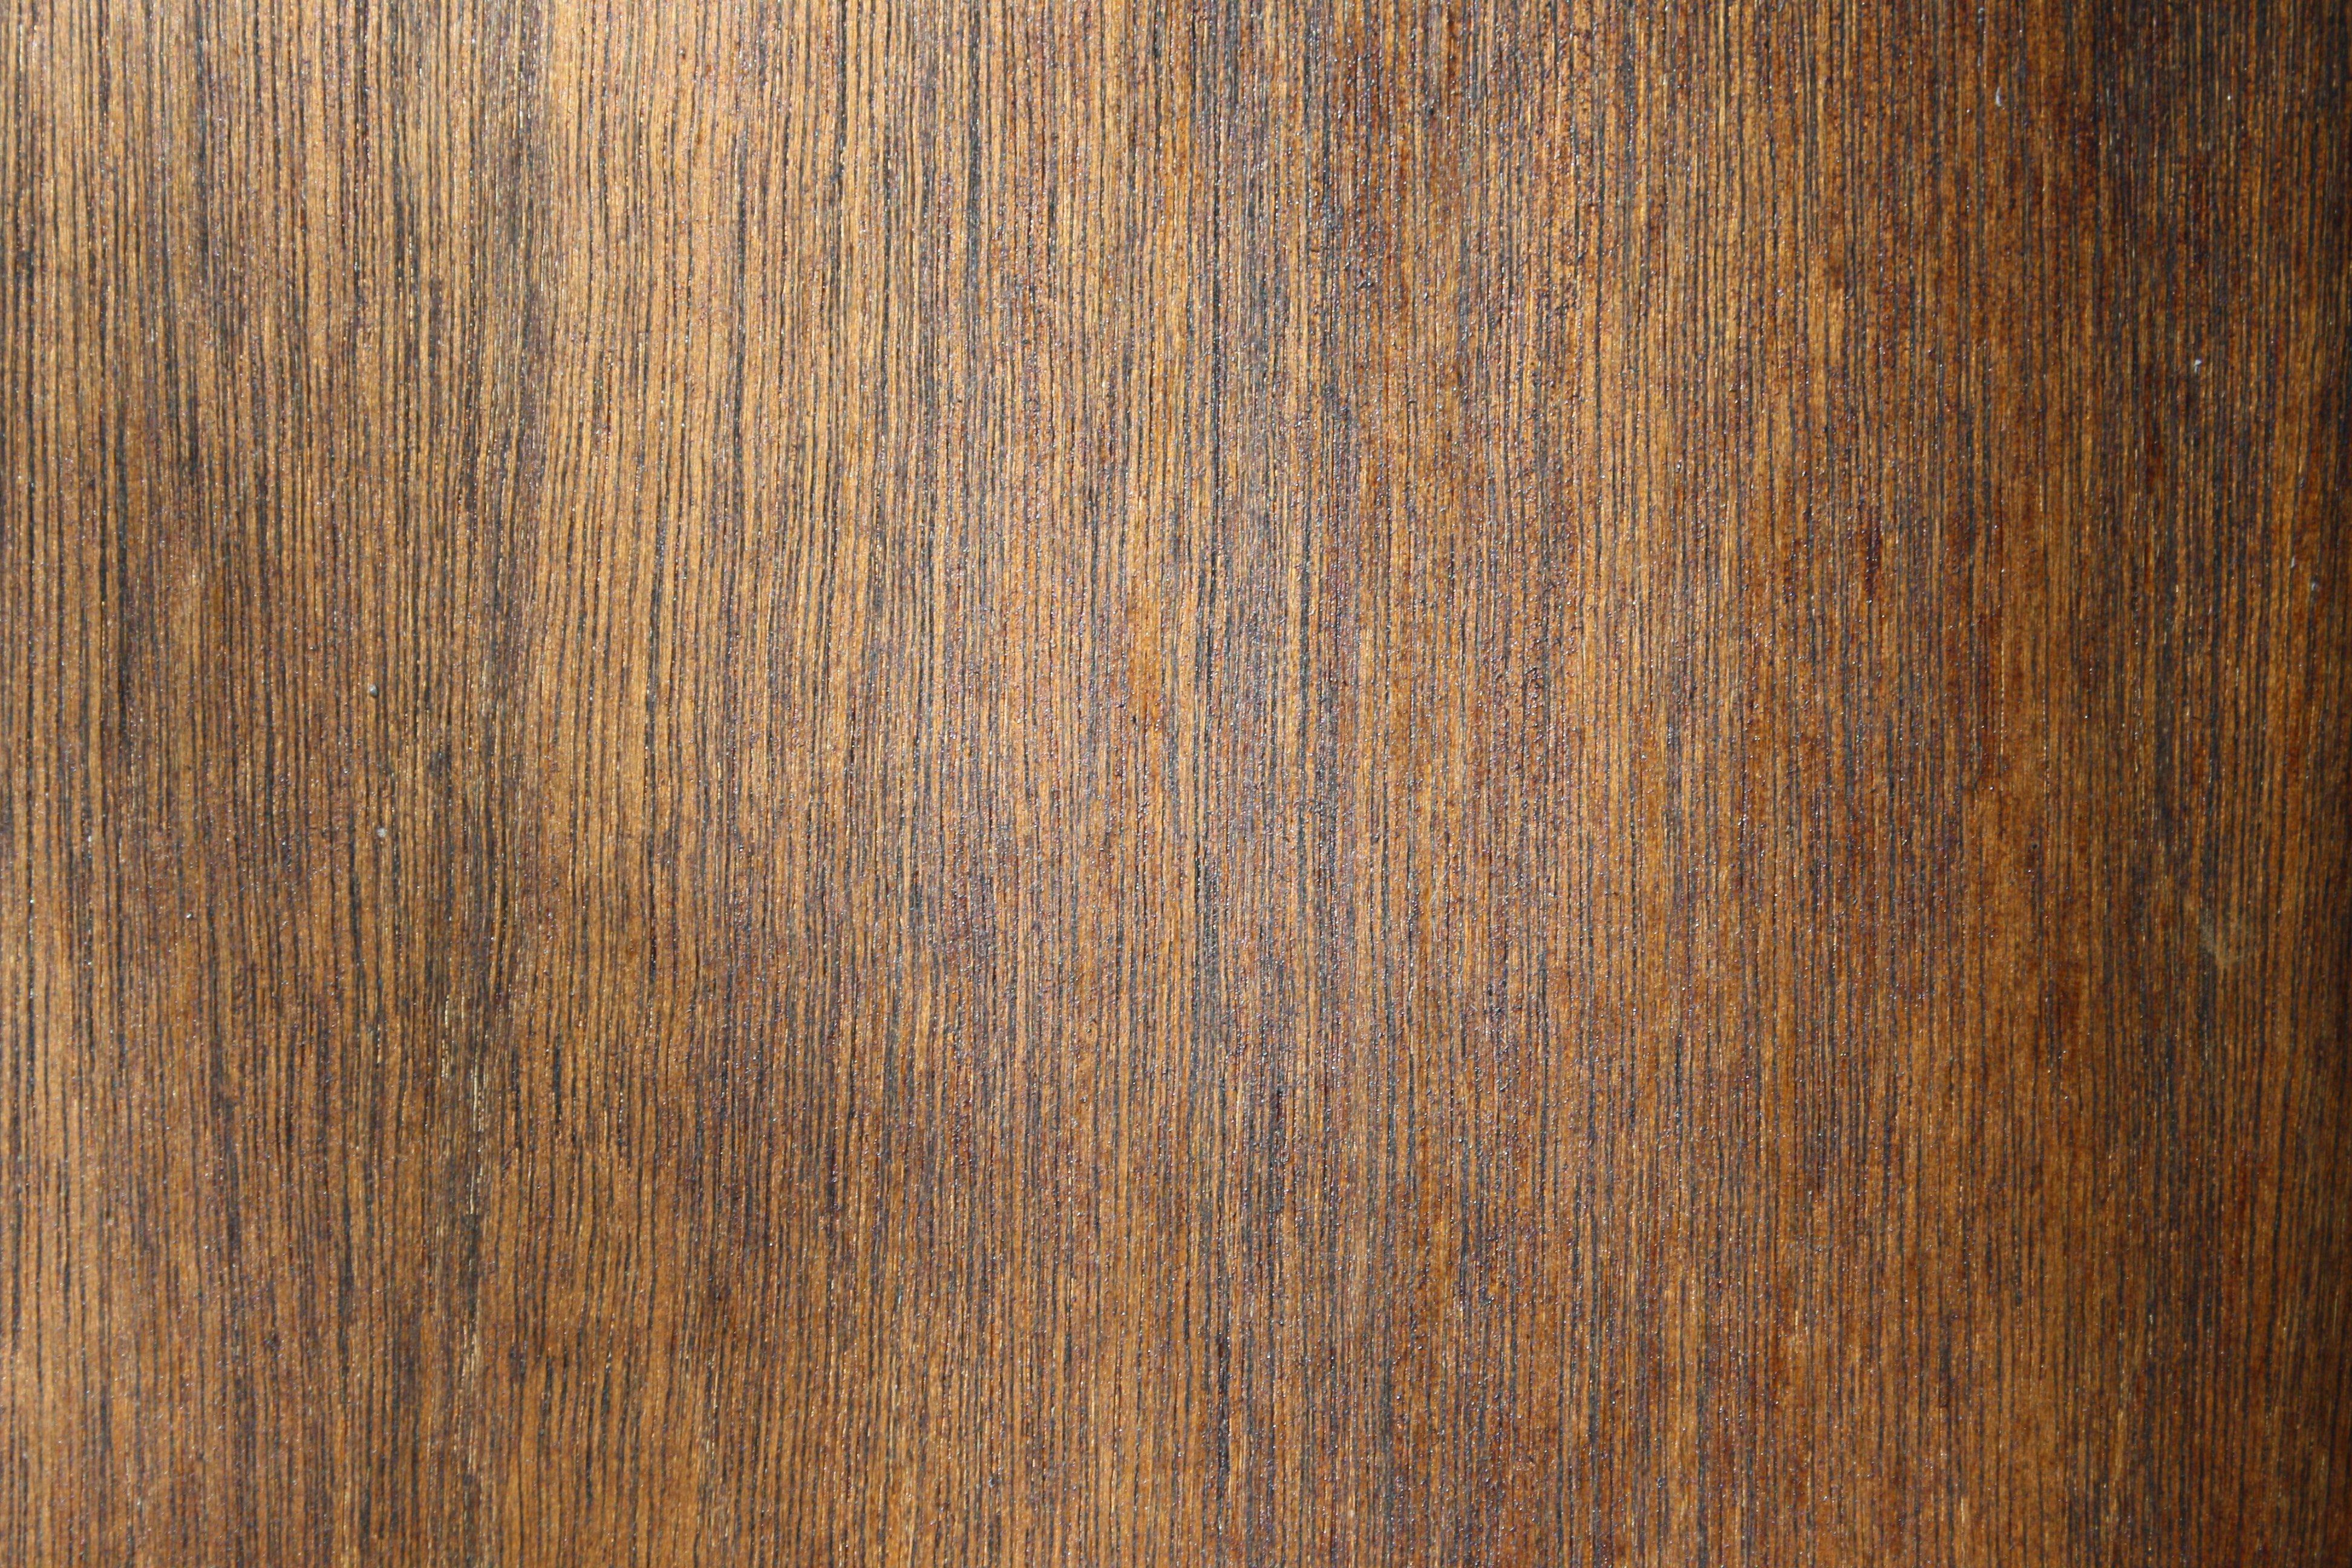 Walnut wood grain wallpaper